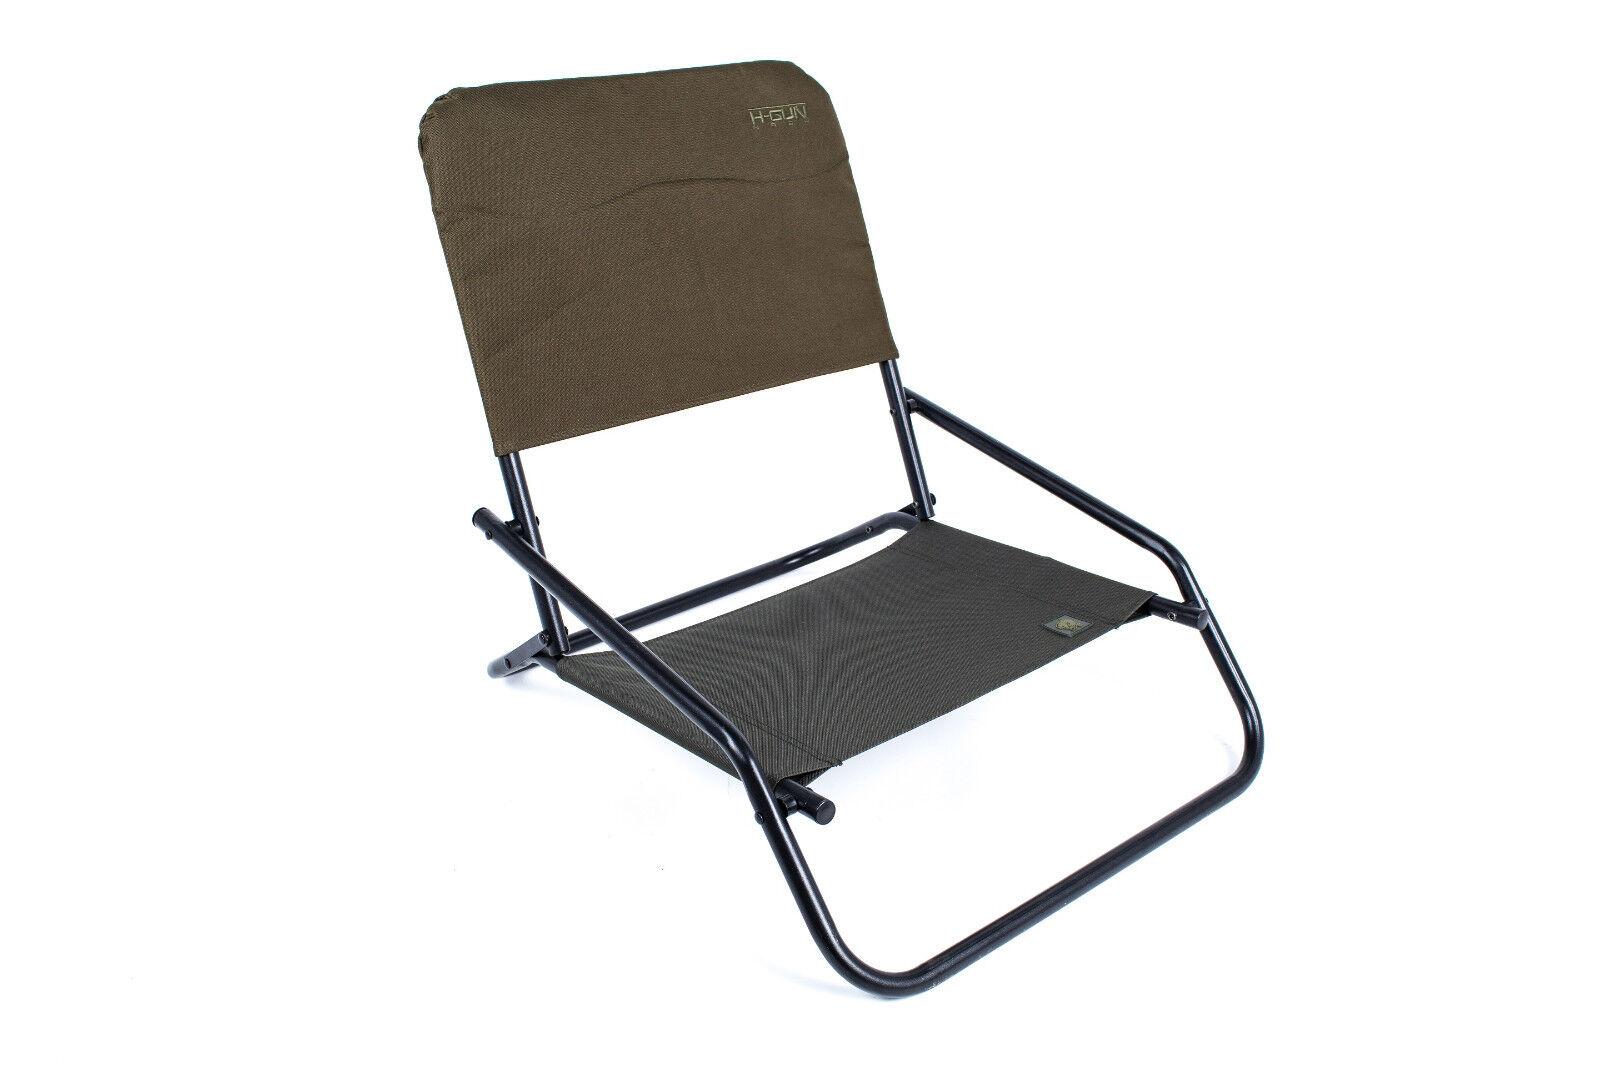 Nash H-Gun Guest  Chair T4402Stuhl Sitz Guestchair Gästesitz Angelstuhl Angelsitz  the best online store offer